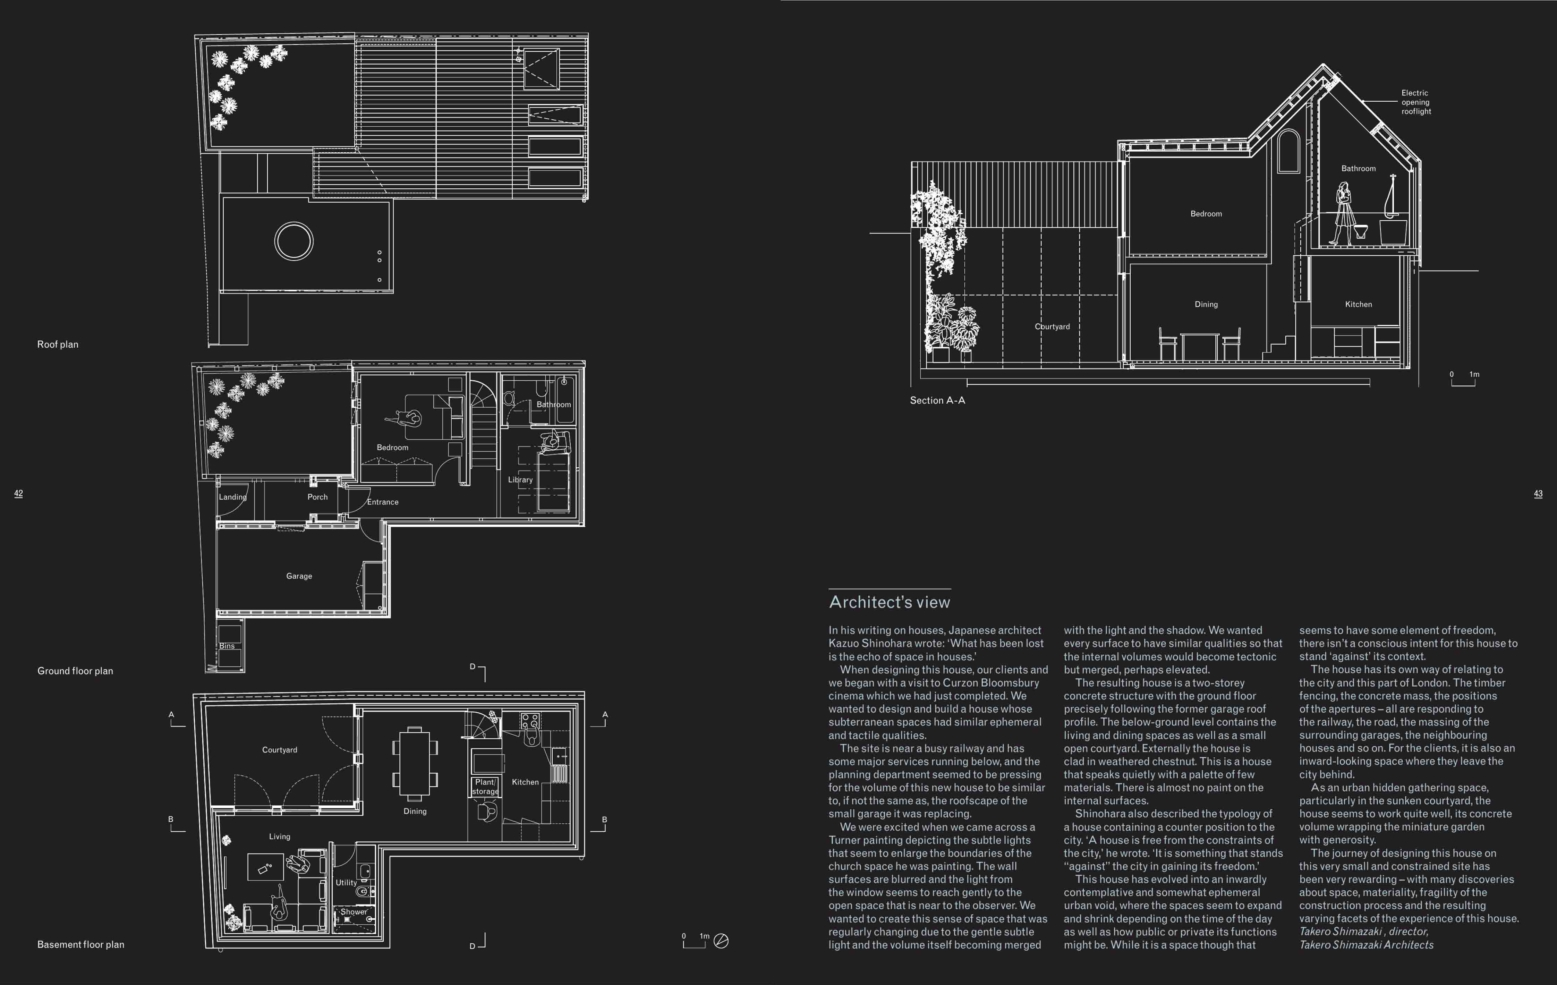 t-sa_Tiverton_Architects Journal_05